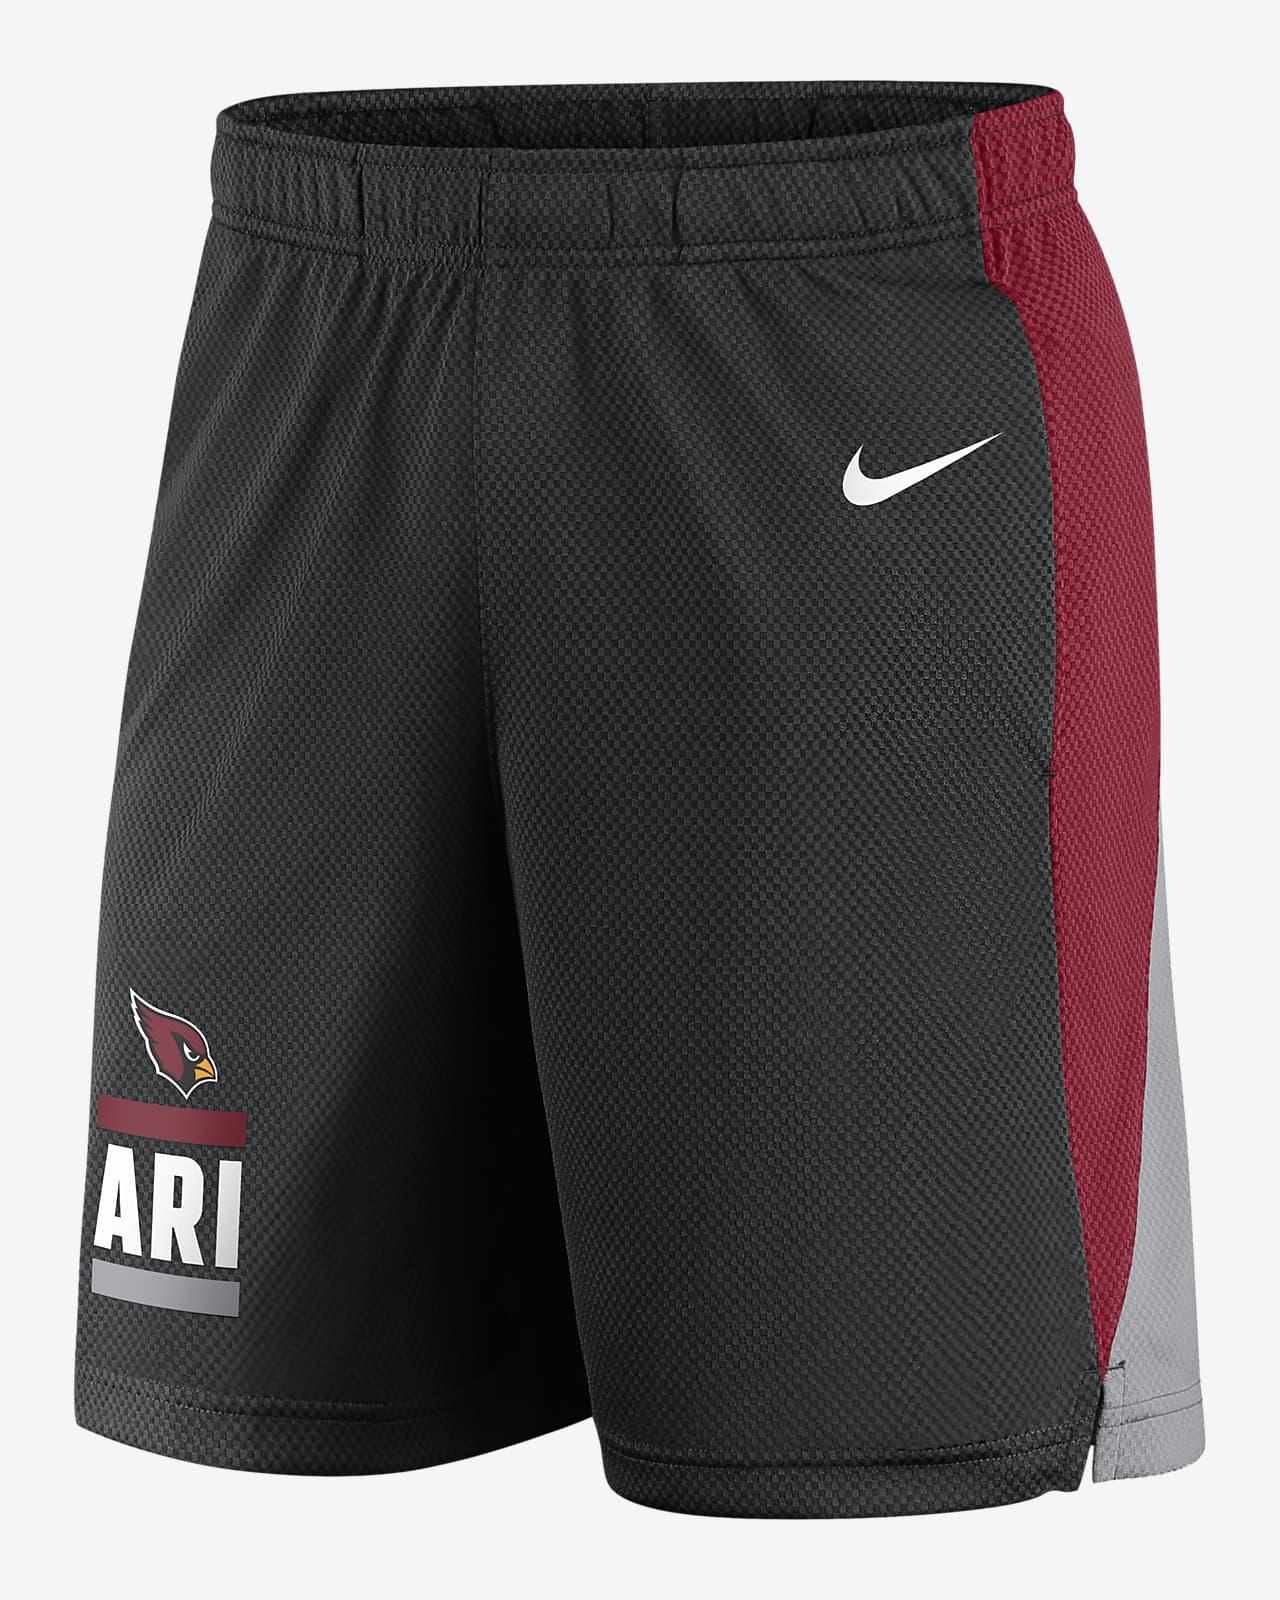 Nike Dri-FIT Broadcast (NFL Arizona Cardinals) Men's Shorts